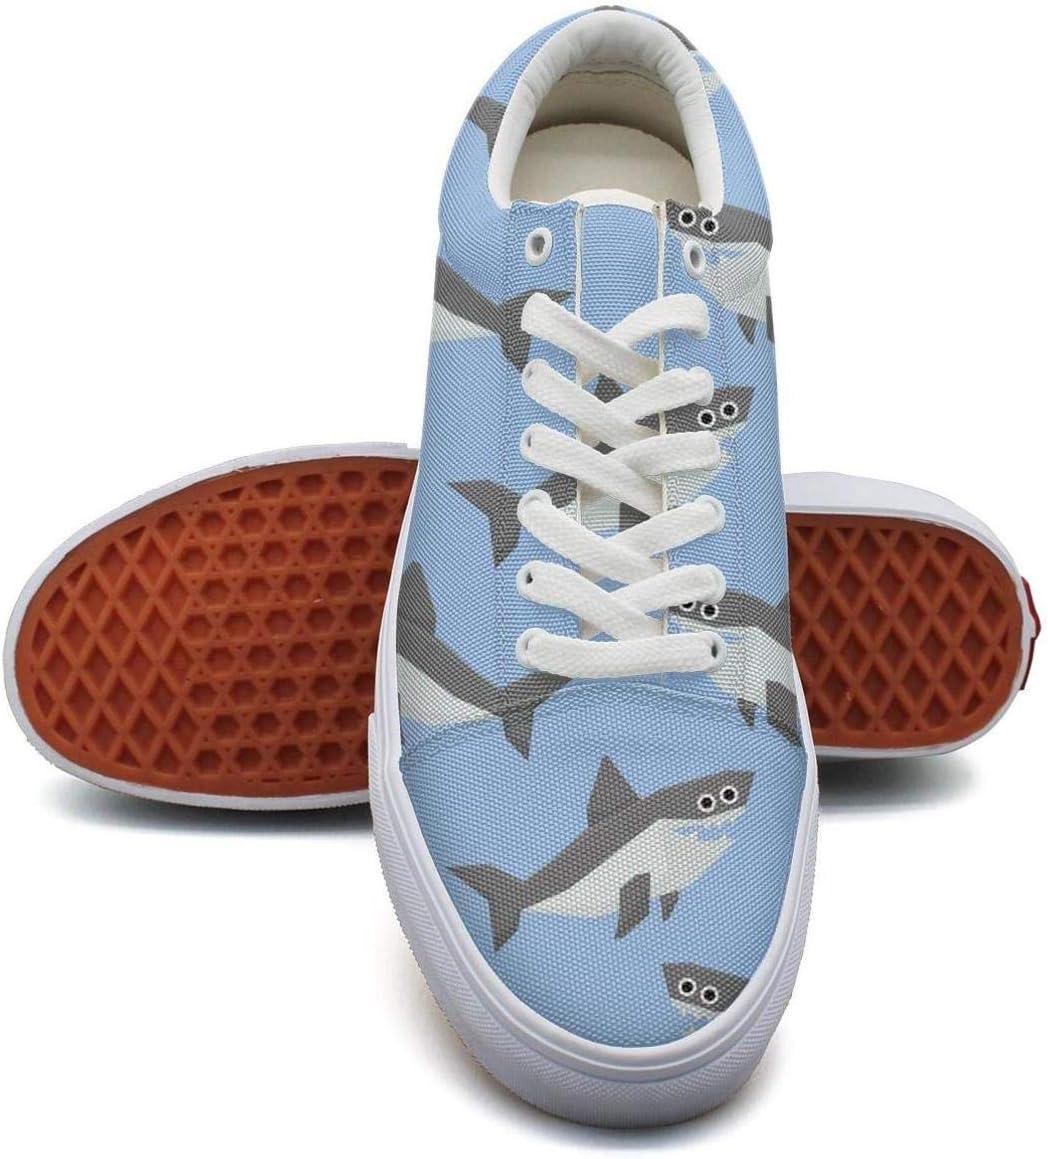 M Ish Original Women Black Low Top Rubber Sole Canvas Sneakers Shoes US 7-12